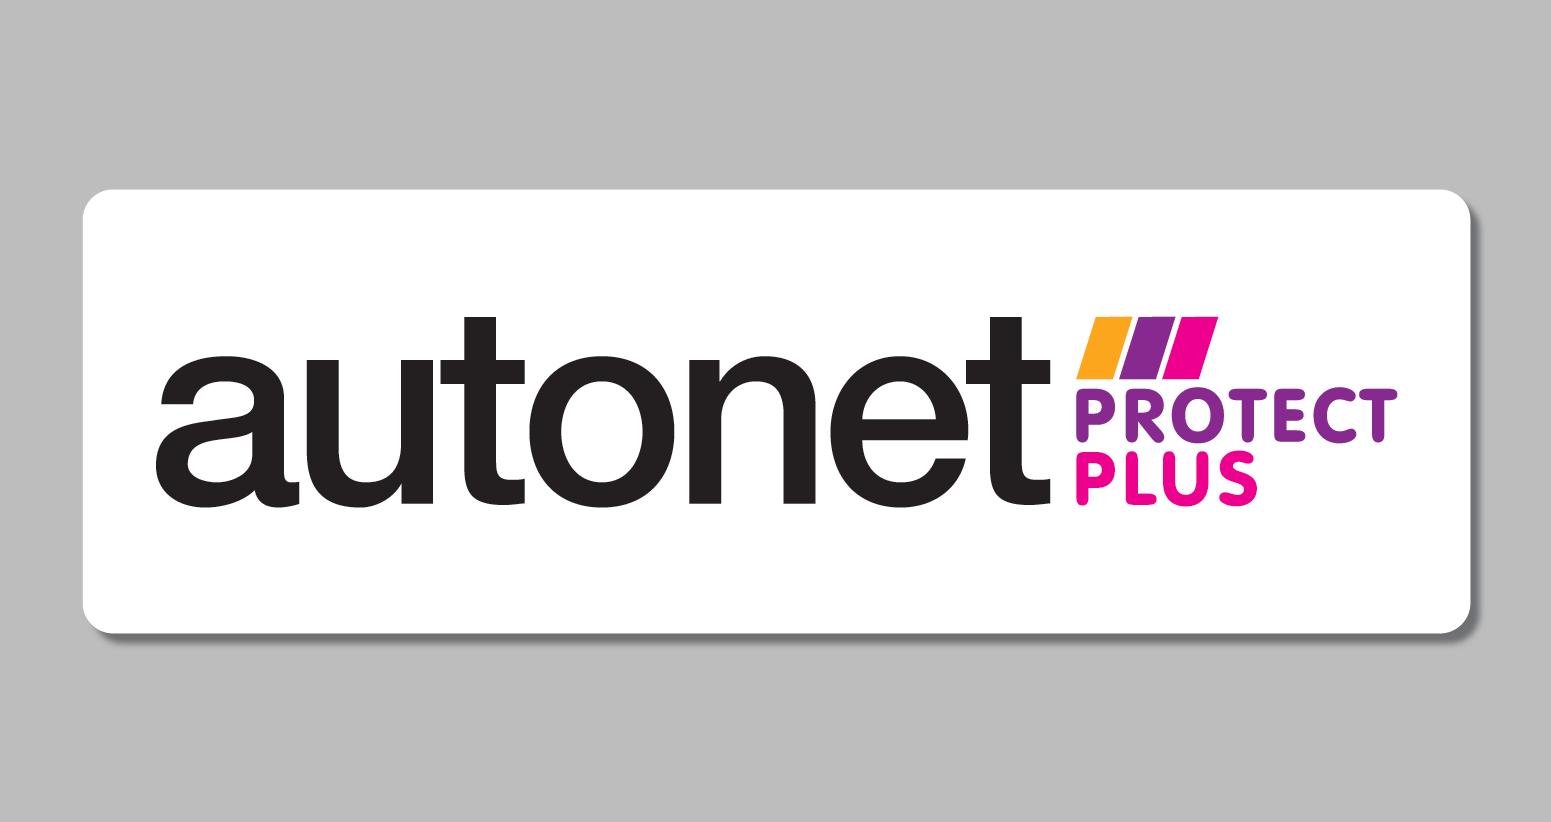 Autonet Protect Plus Logo